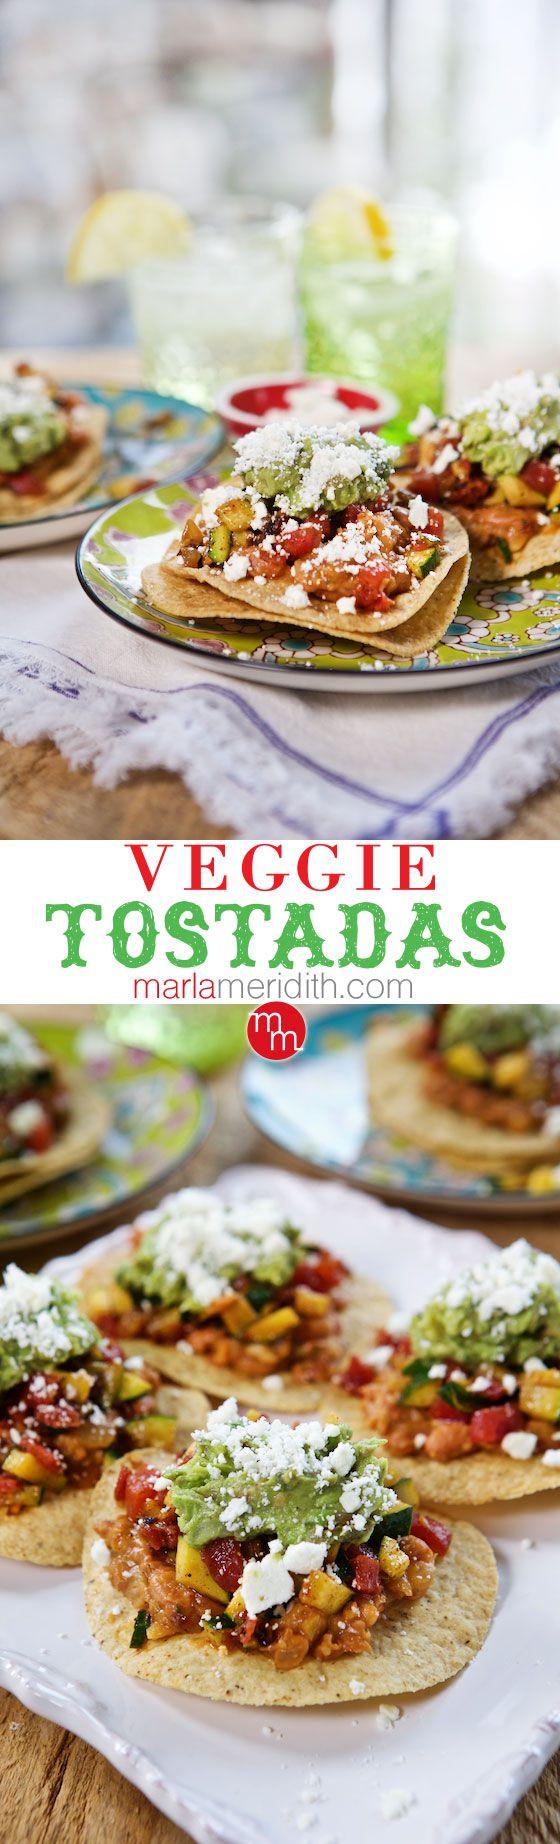 Veggie Tostadas | A delish #recipe for Cinco de Mayo, don't forget the margaritas! | MarlMeridith.com (@marlameridith )